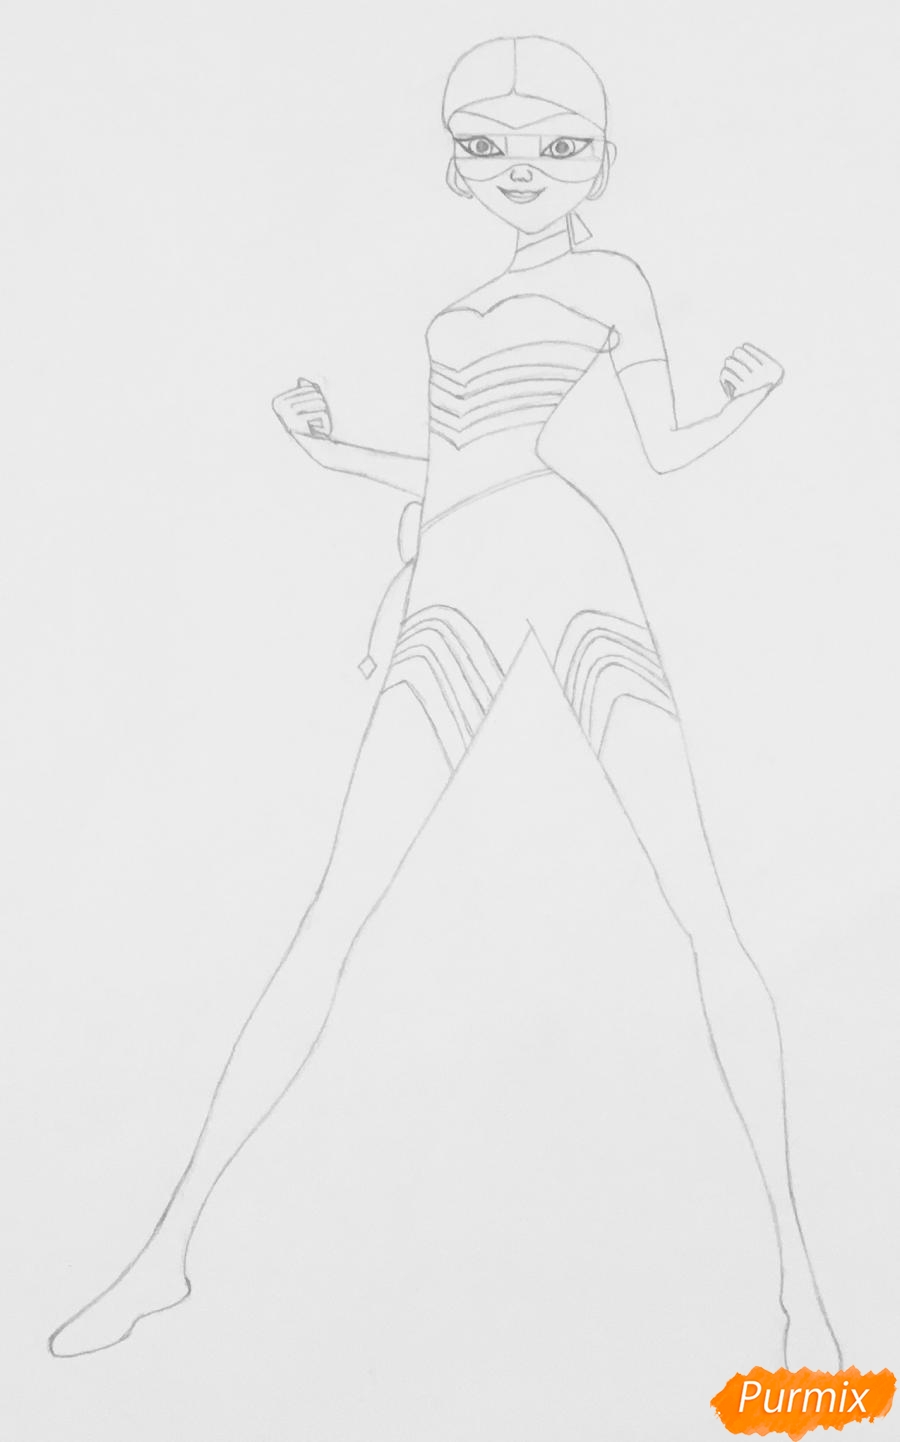 Рисуем Хлою пчелу из мультфильма Леди Баг и Супер Кот - фото 4